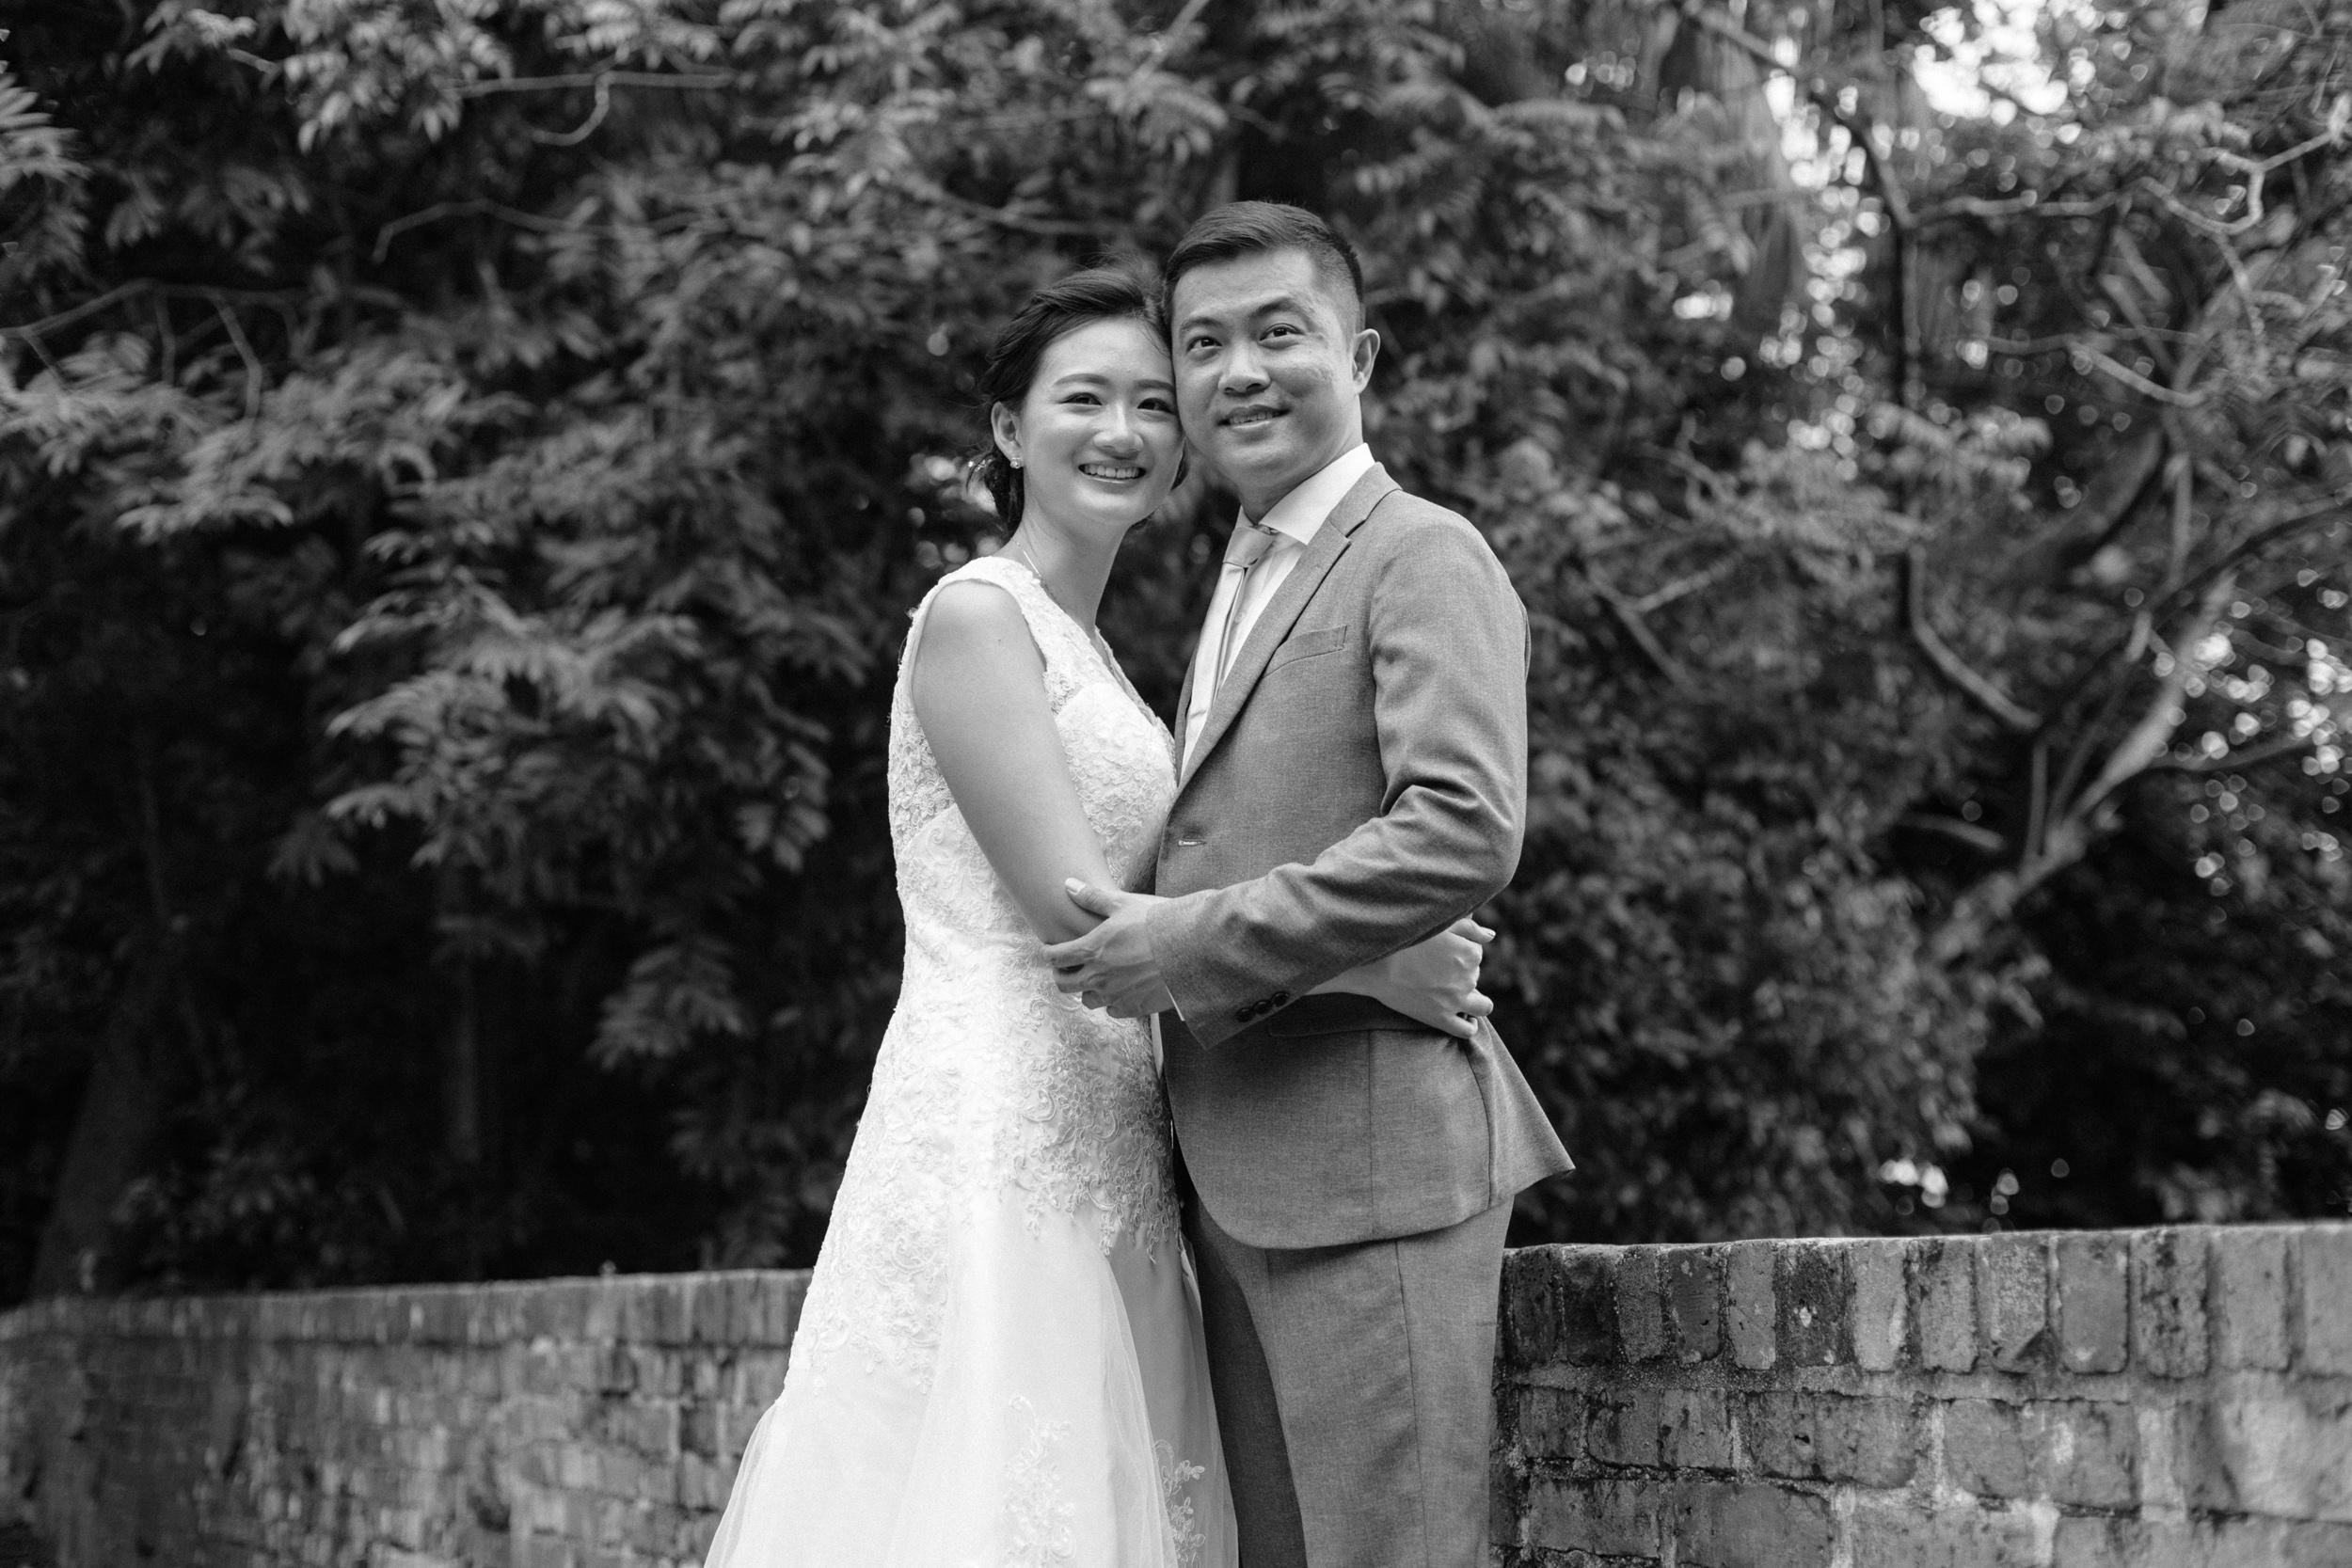 singapore-wedding-photographer-wemadethese-junekit-kingslin-04.jpg